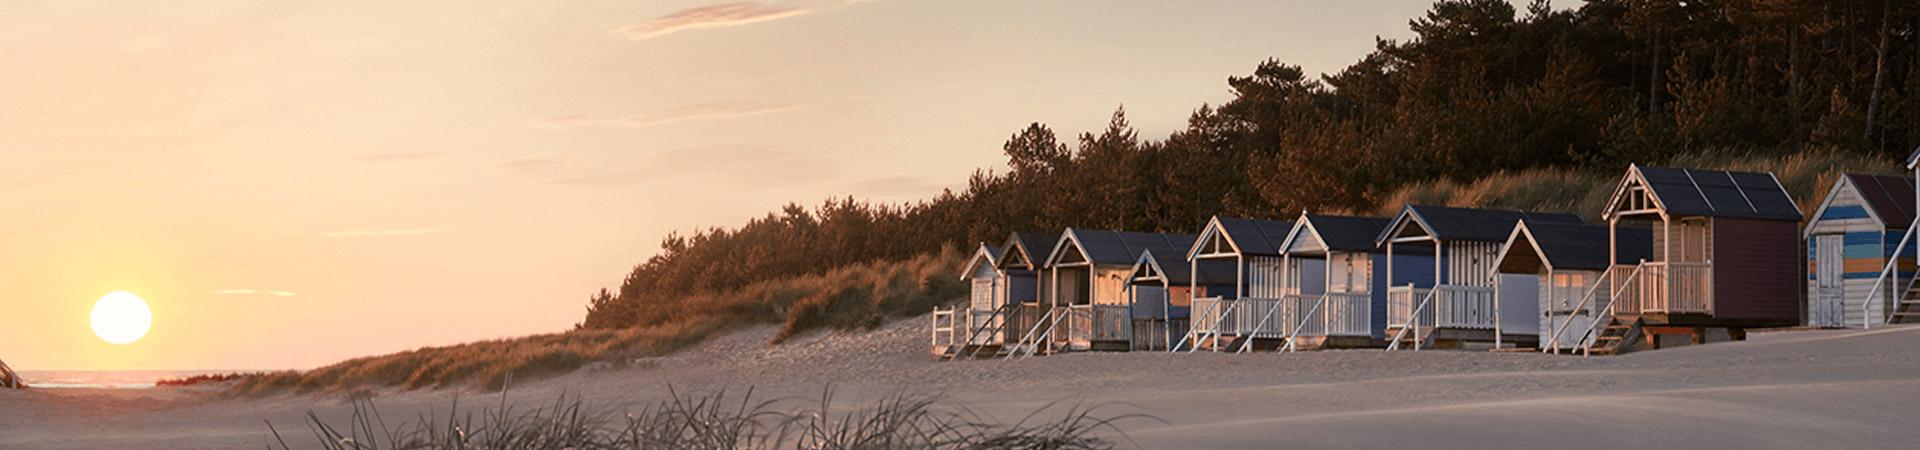 Beach Hut Man